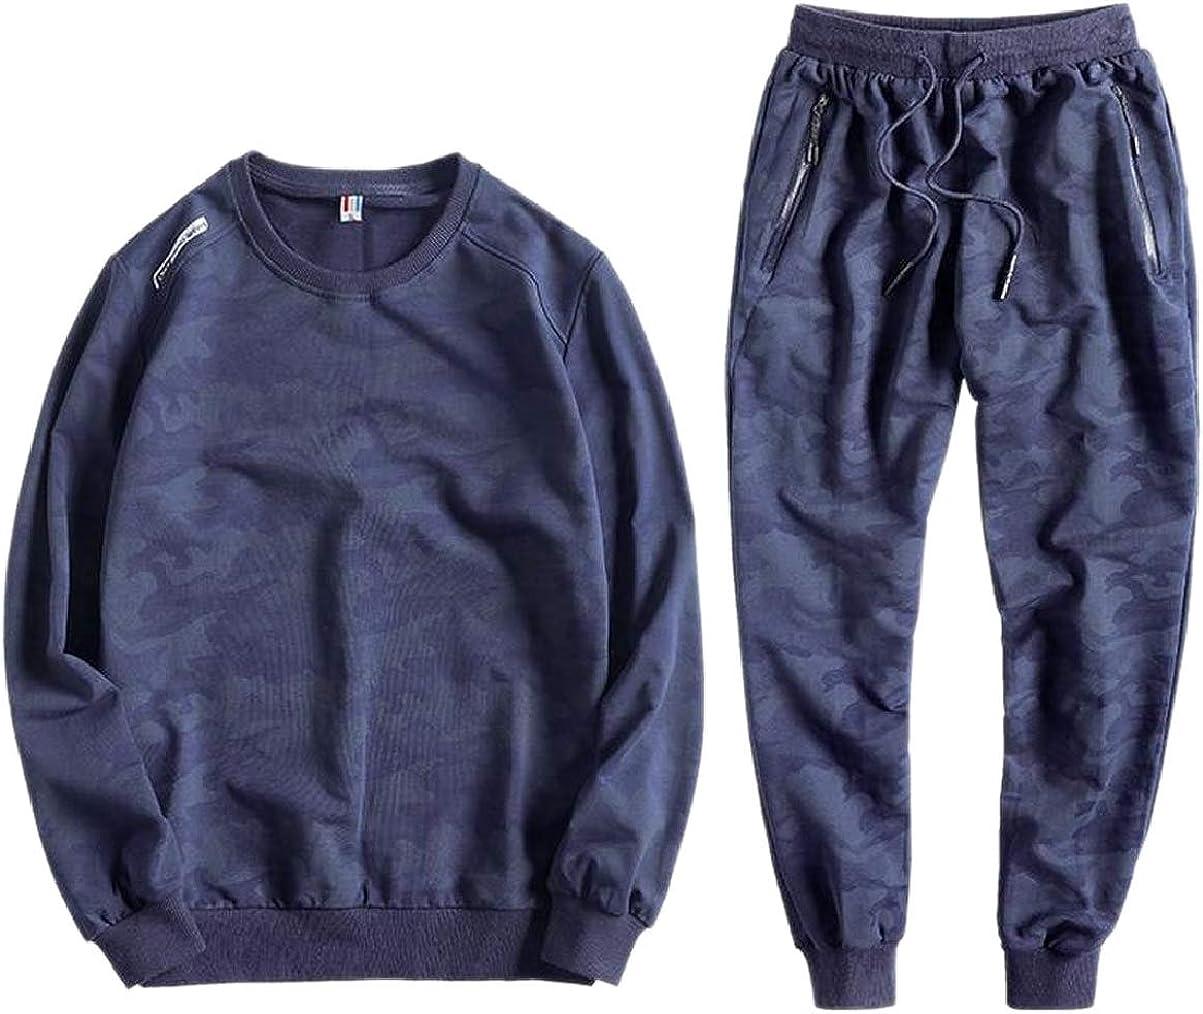 YIhujiuben Men Sweatsuit Elastic Waist Pants Big and Tall Sweatshirts Camouflage Printed Tracksuit Set Dark Blue XS